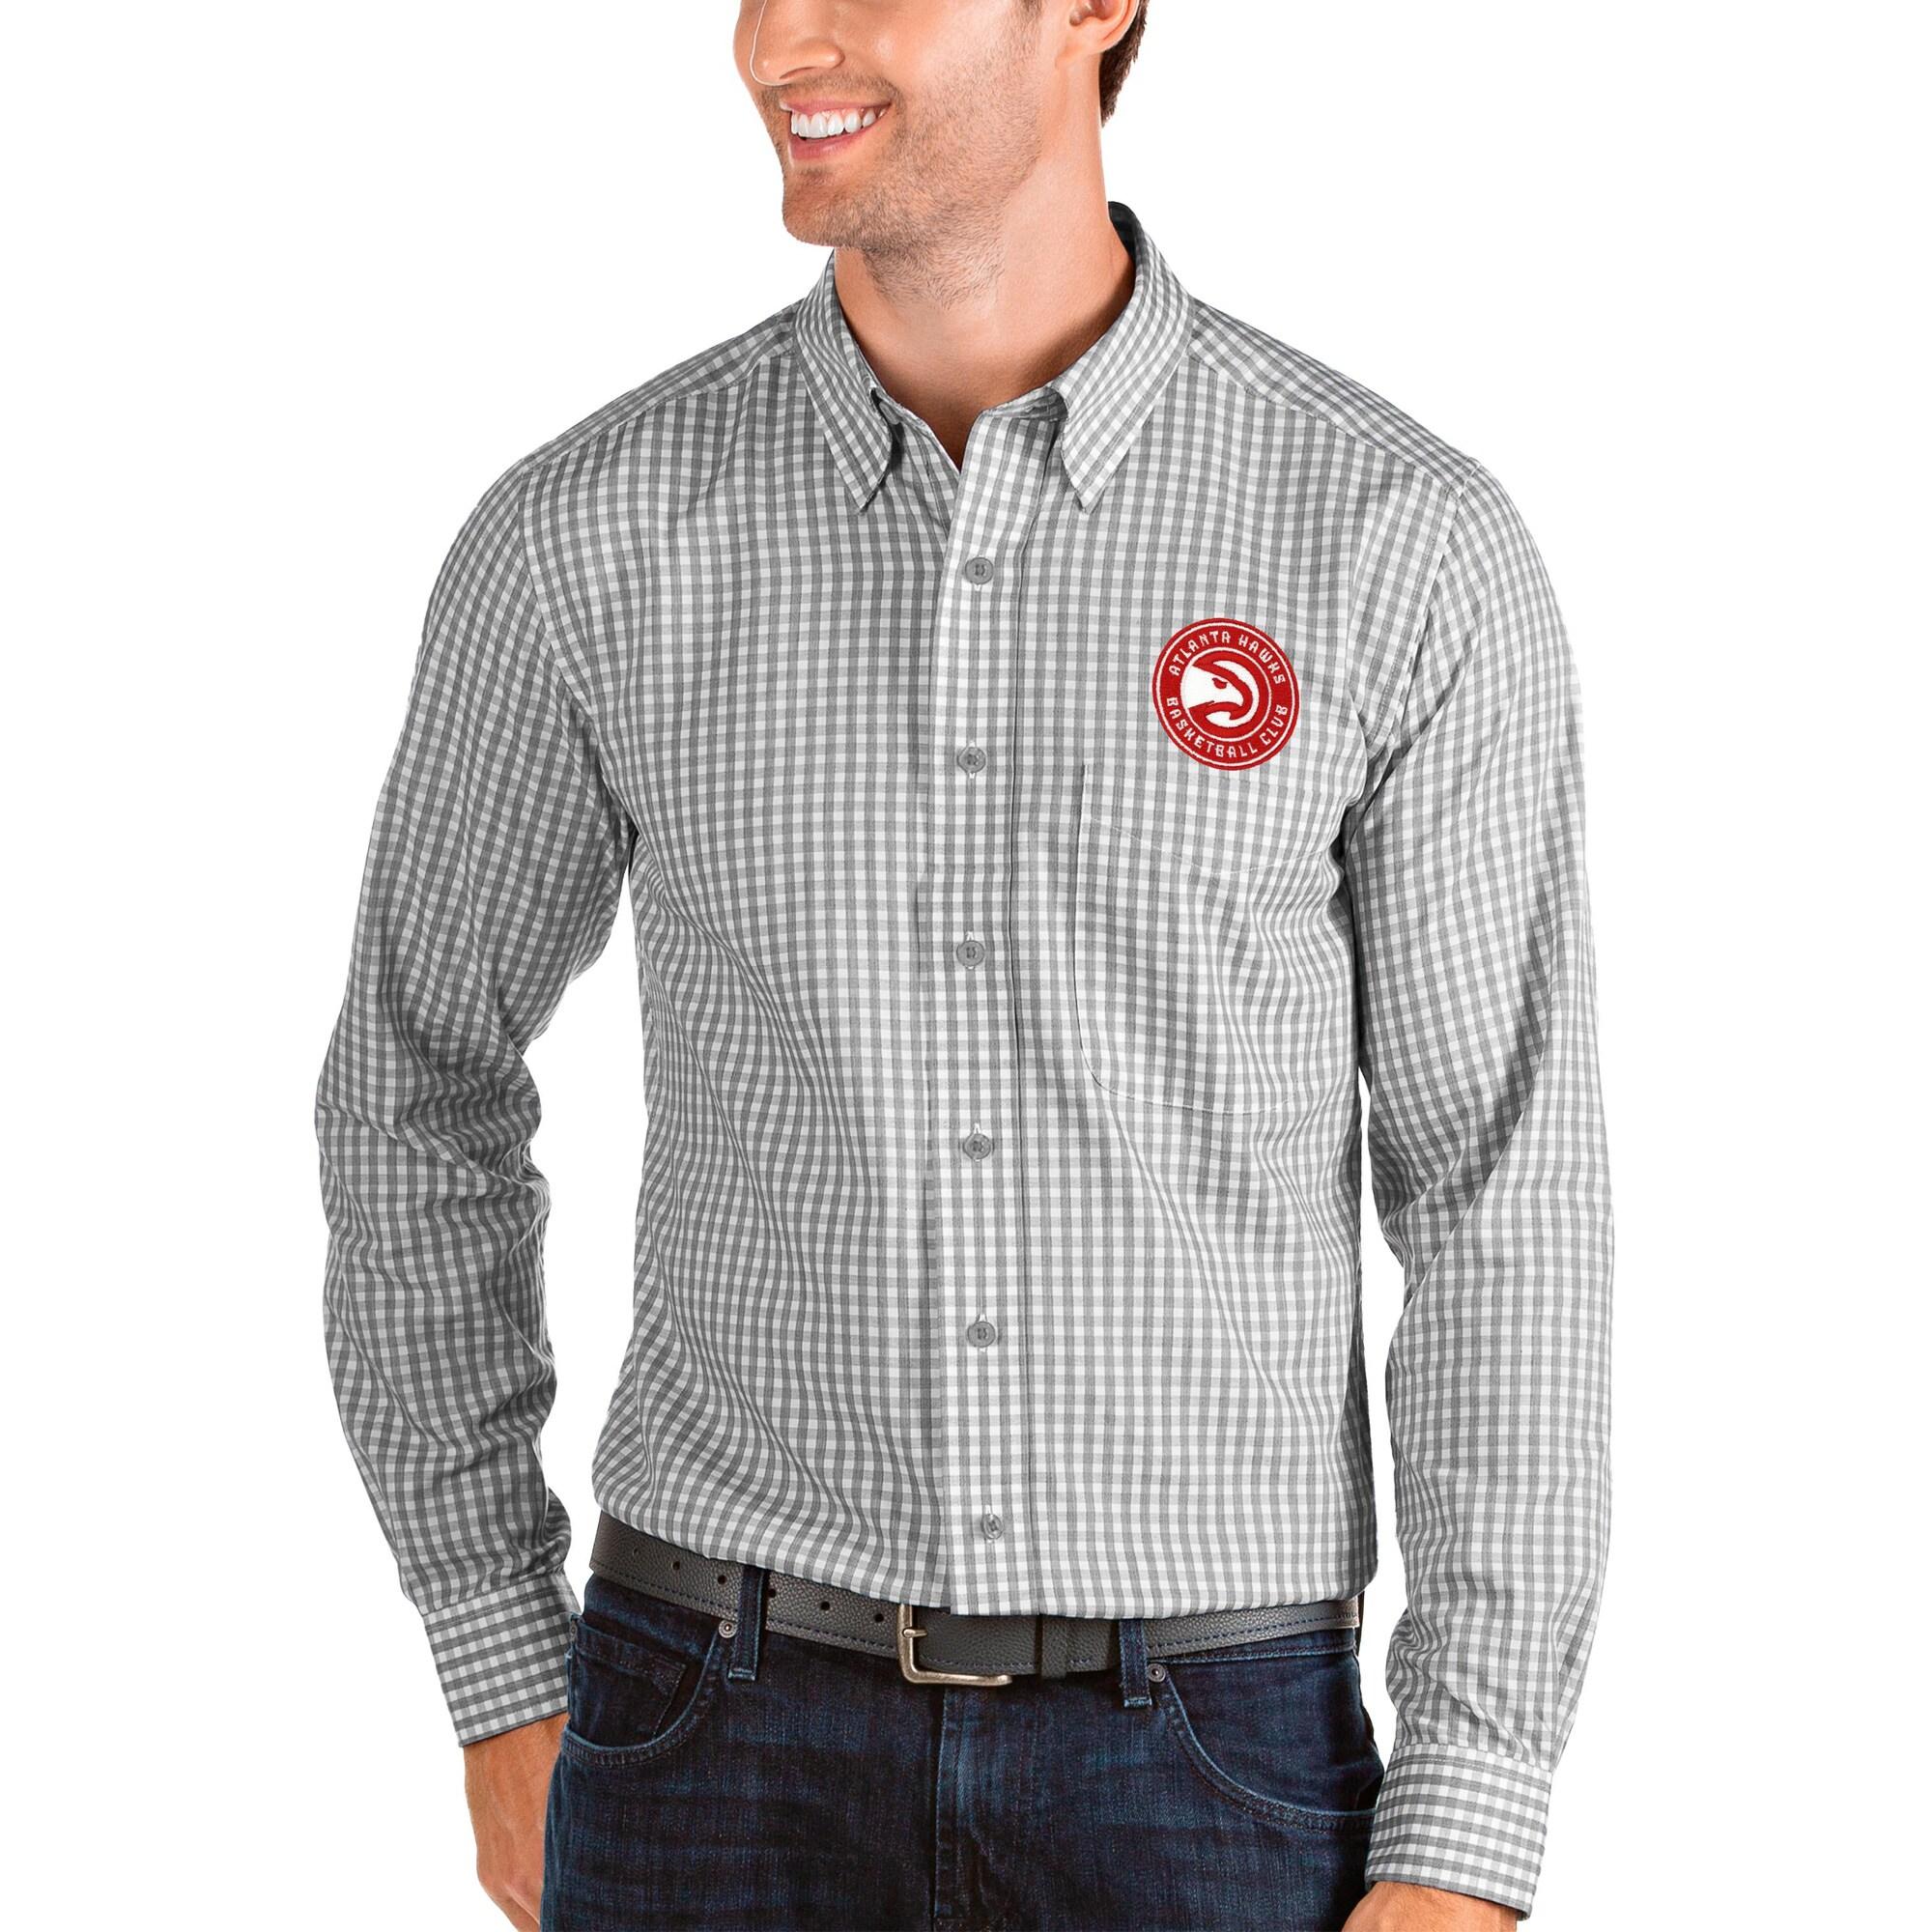 Atlanta Hawks Antigua Structure Long Sleeve Button-Up Shirt - Charcoal/White